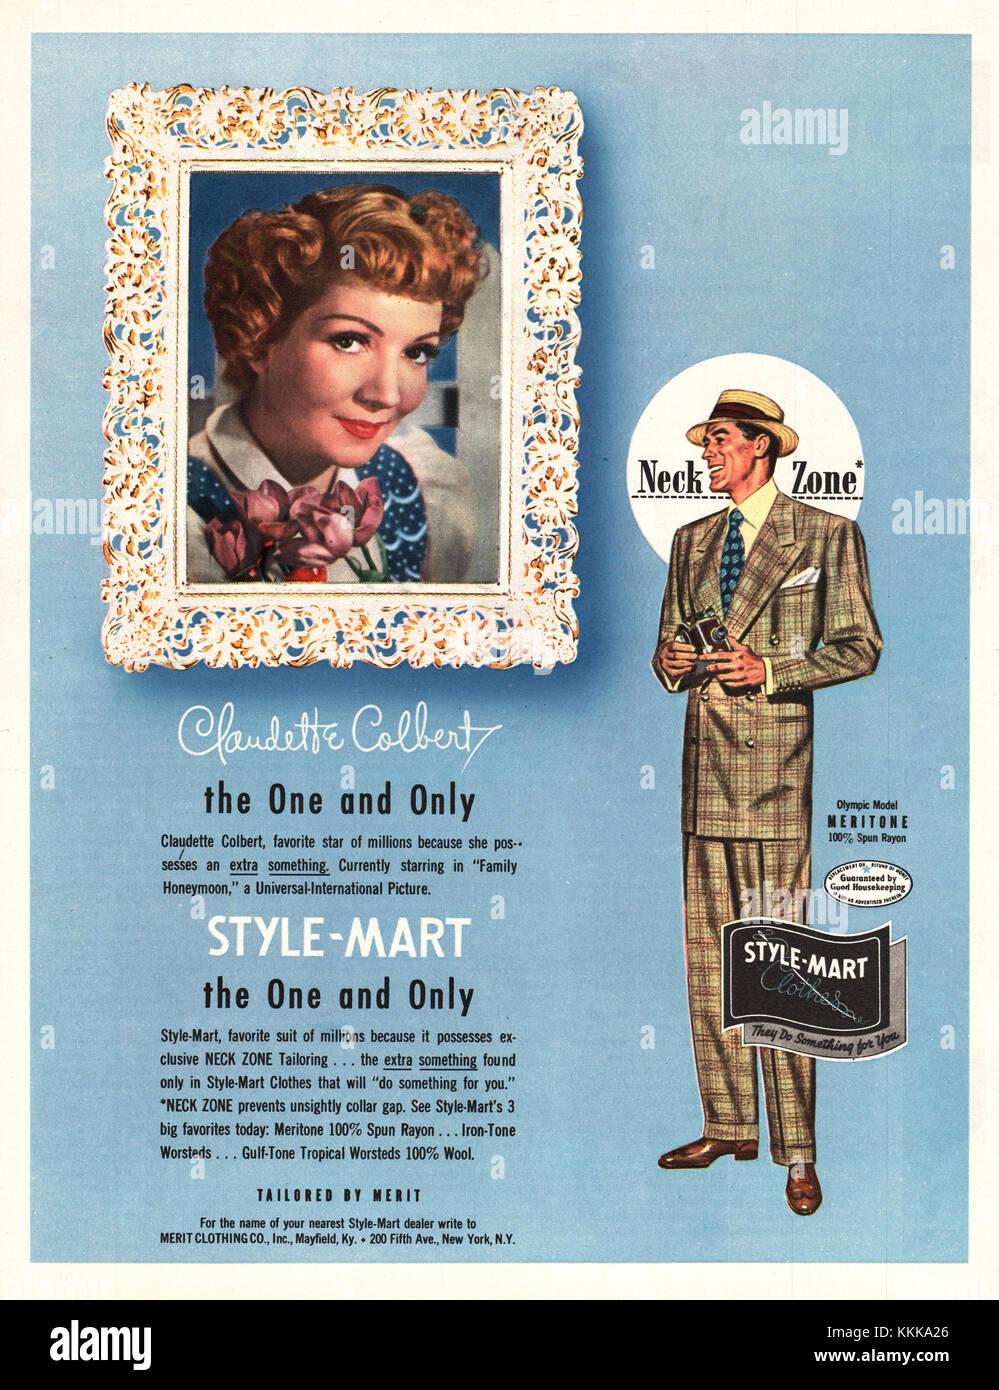 1949 U S  Magazine Style-Mart Suits Advert Stock Photo: 166996766